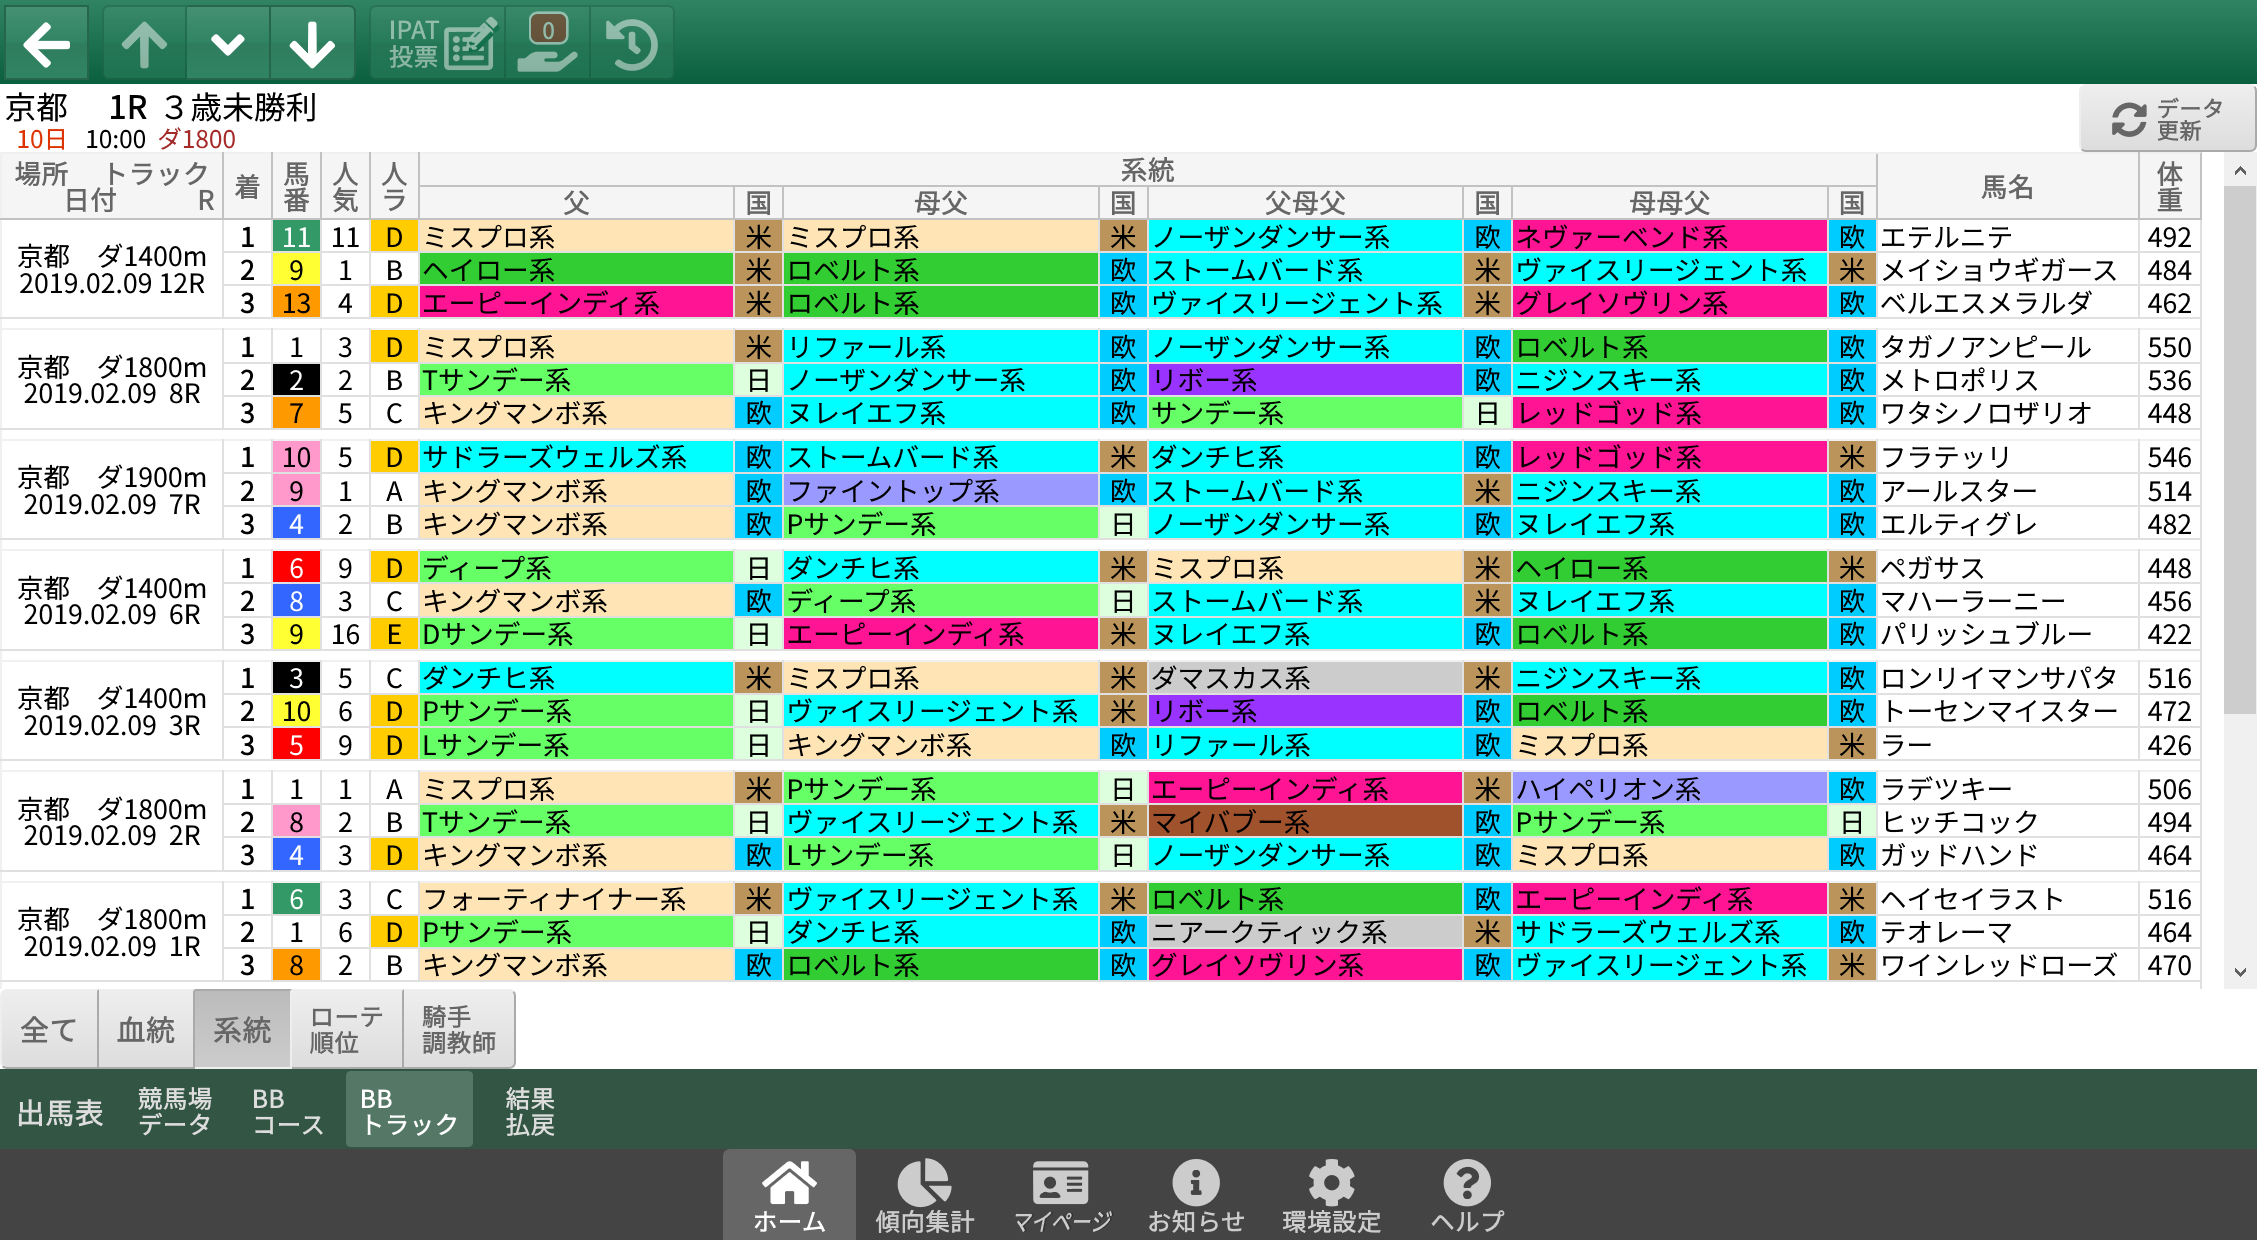 2/9(土)京都競馬 1~3着内好走馬の傾向(血統・系統・ローテ・パターン・騎手・調教師)